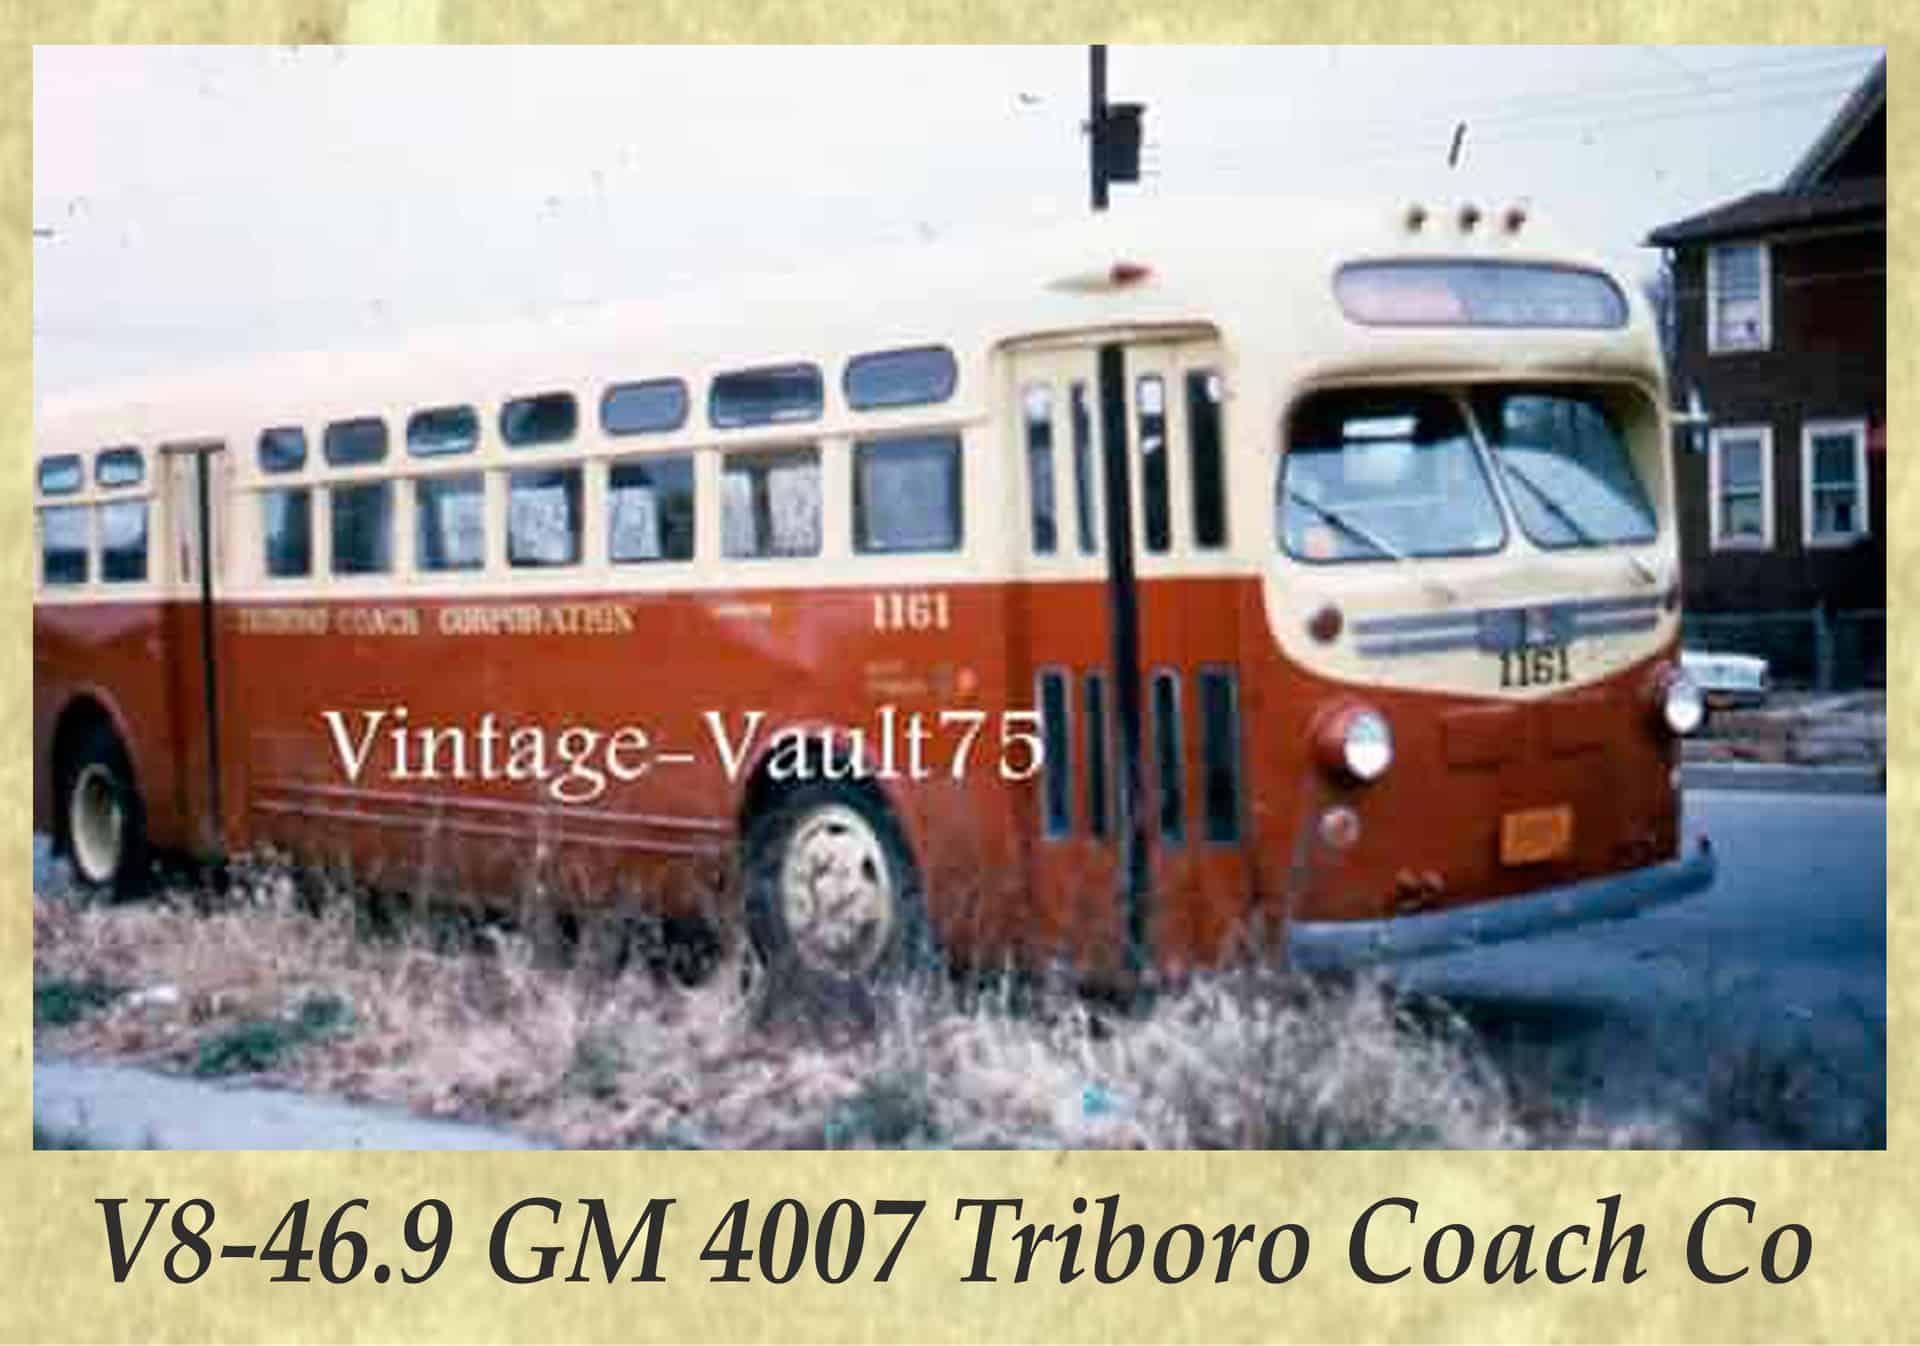 V8-46.9 GM 4007 Triboro Coach Co